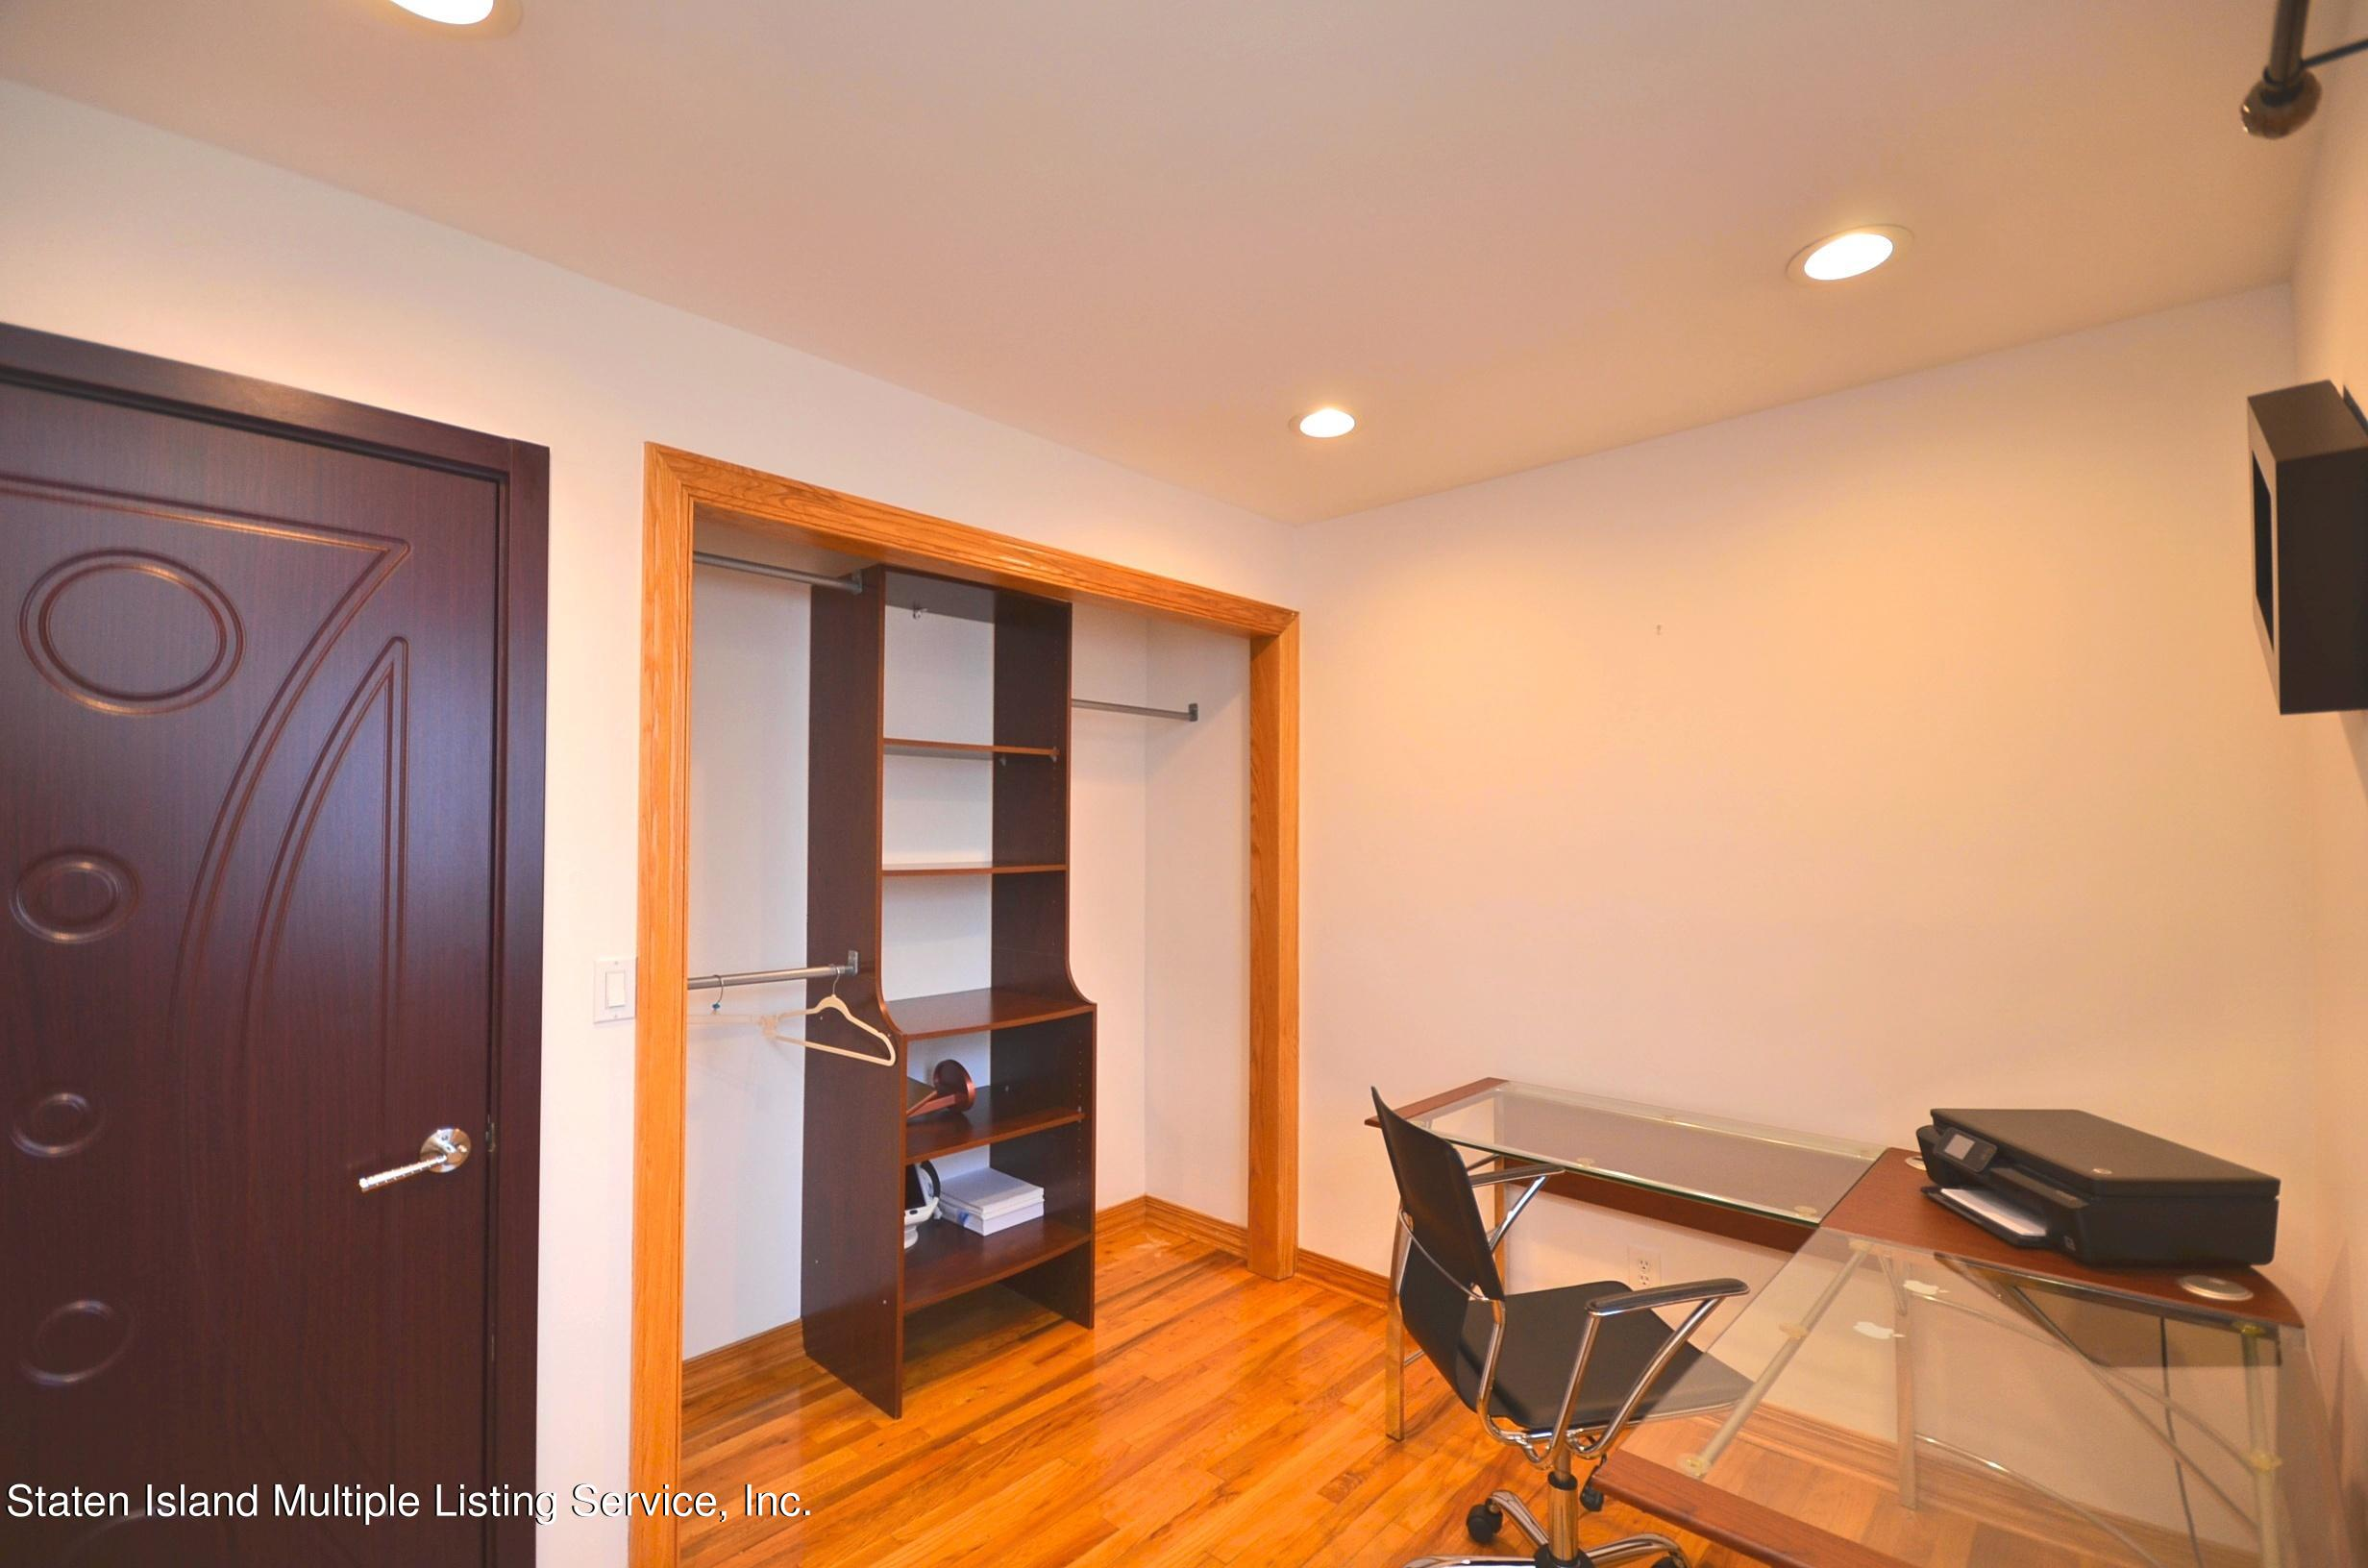 Single Family - Detached 48 Ocean Terrace  Staten Island, NY 10314, MLS-1142240-21